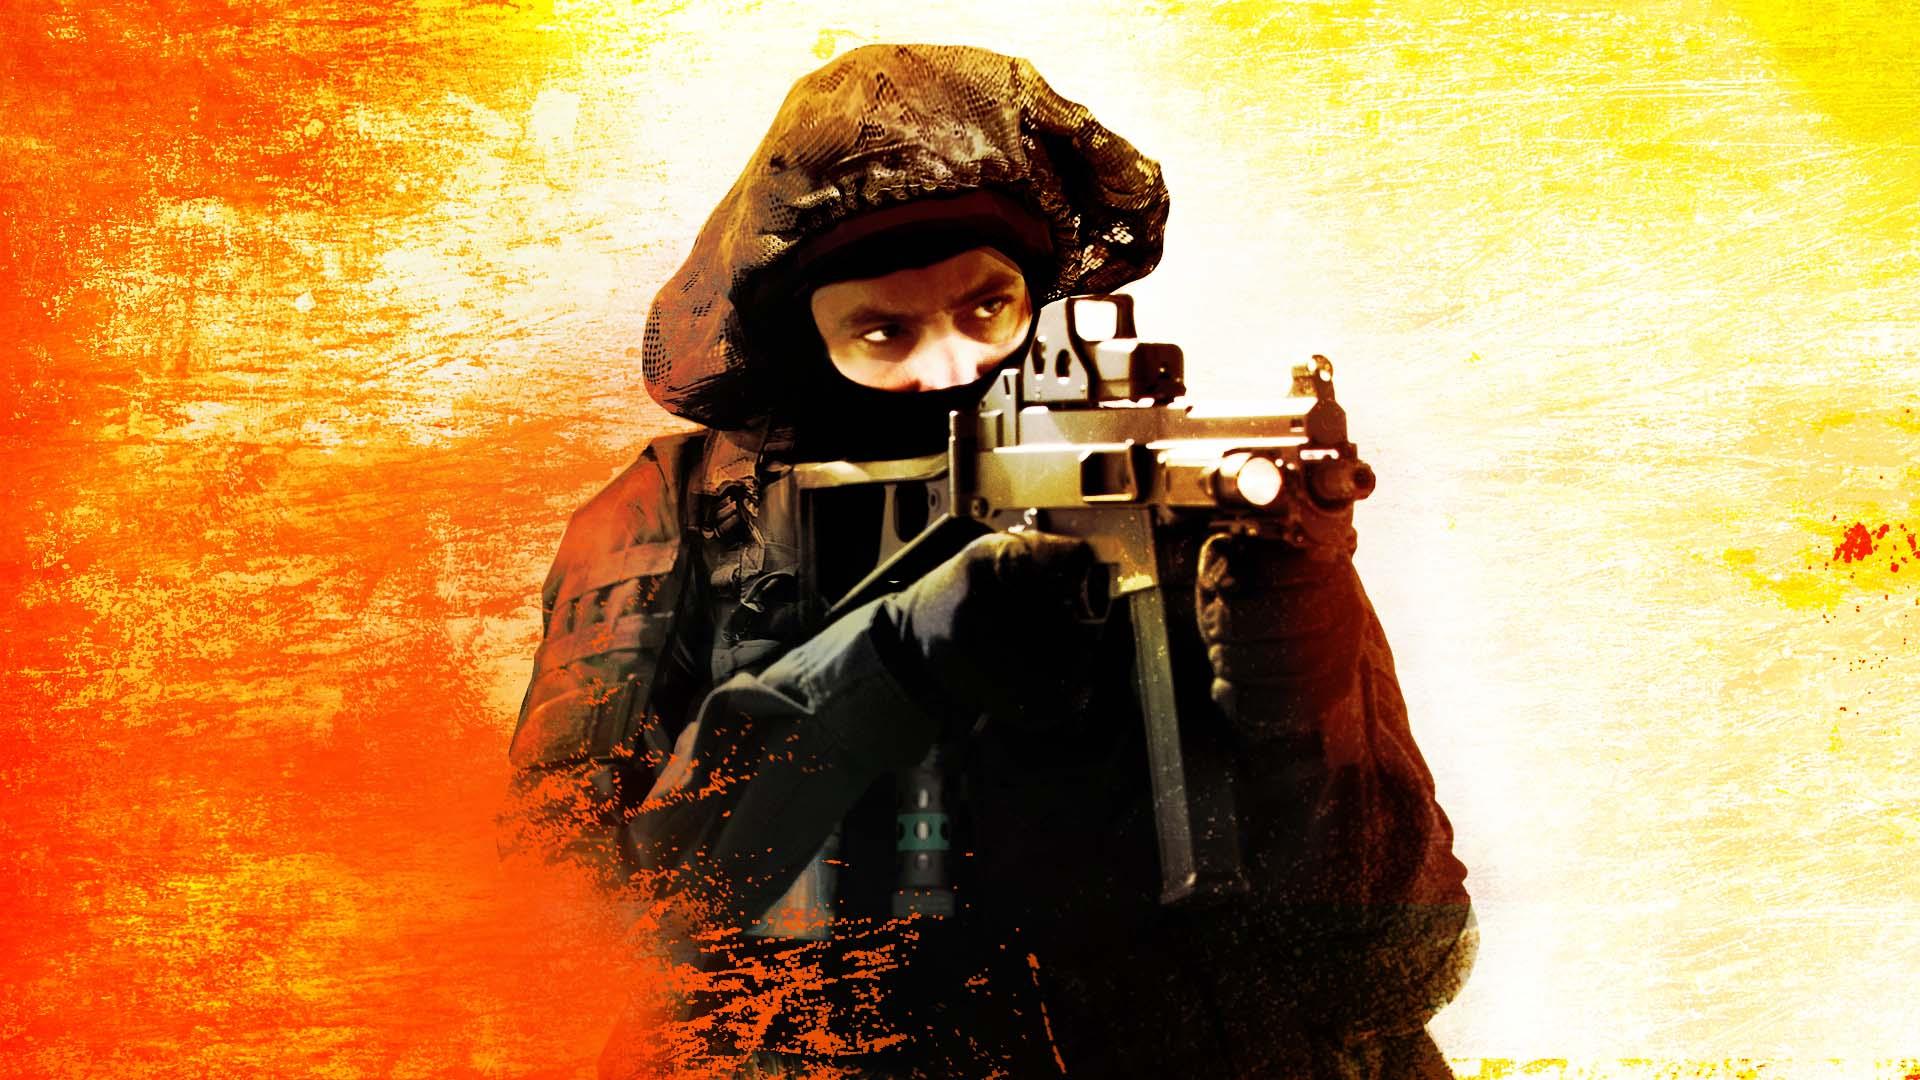 Counter Strike Global Offensive - CS Go wallpaper 18